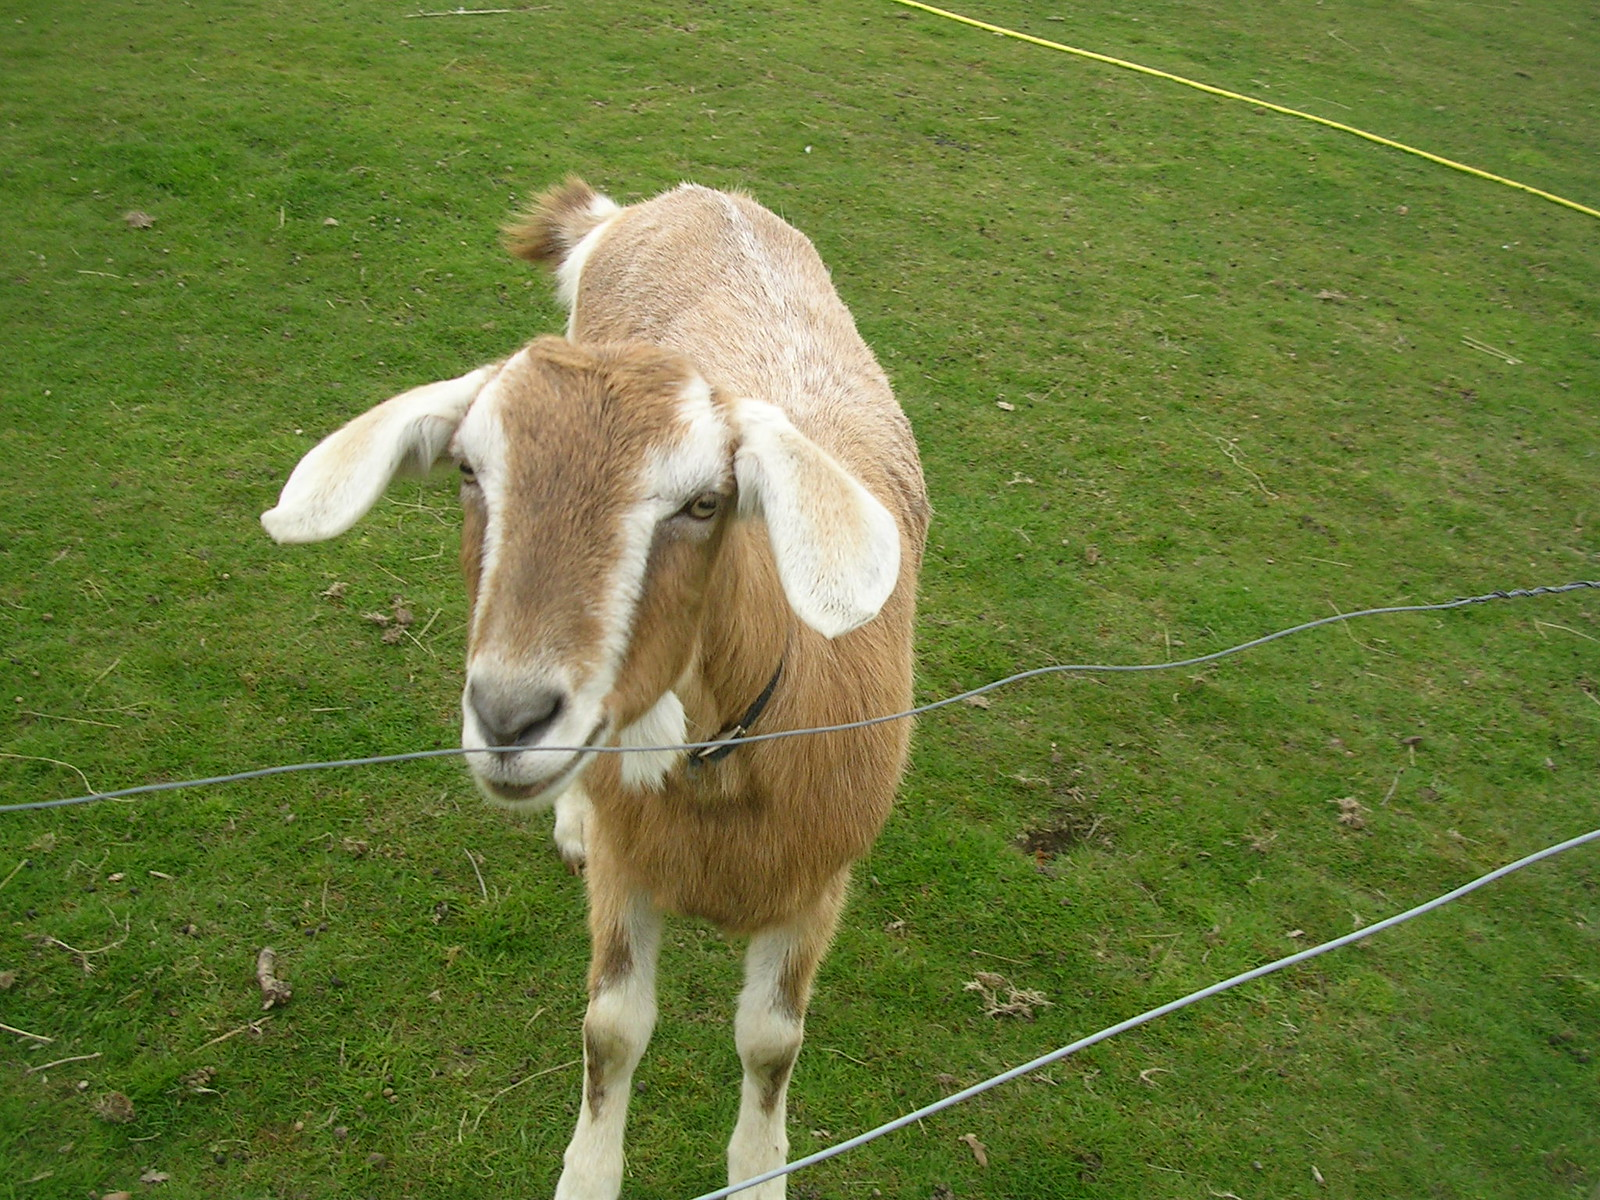 The goat gang Goat B. Manningtree circular